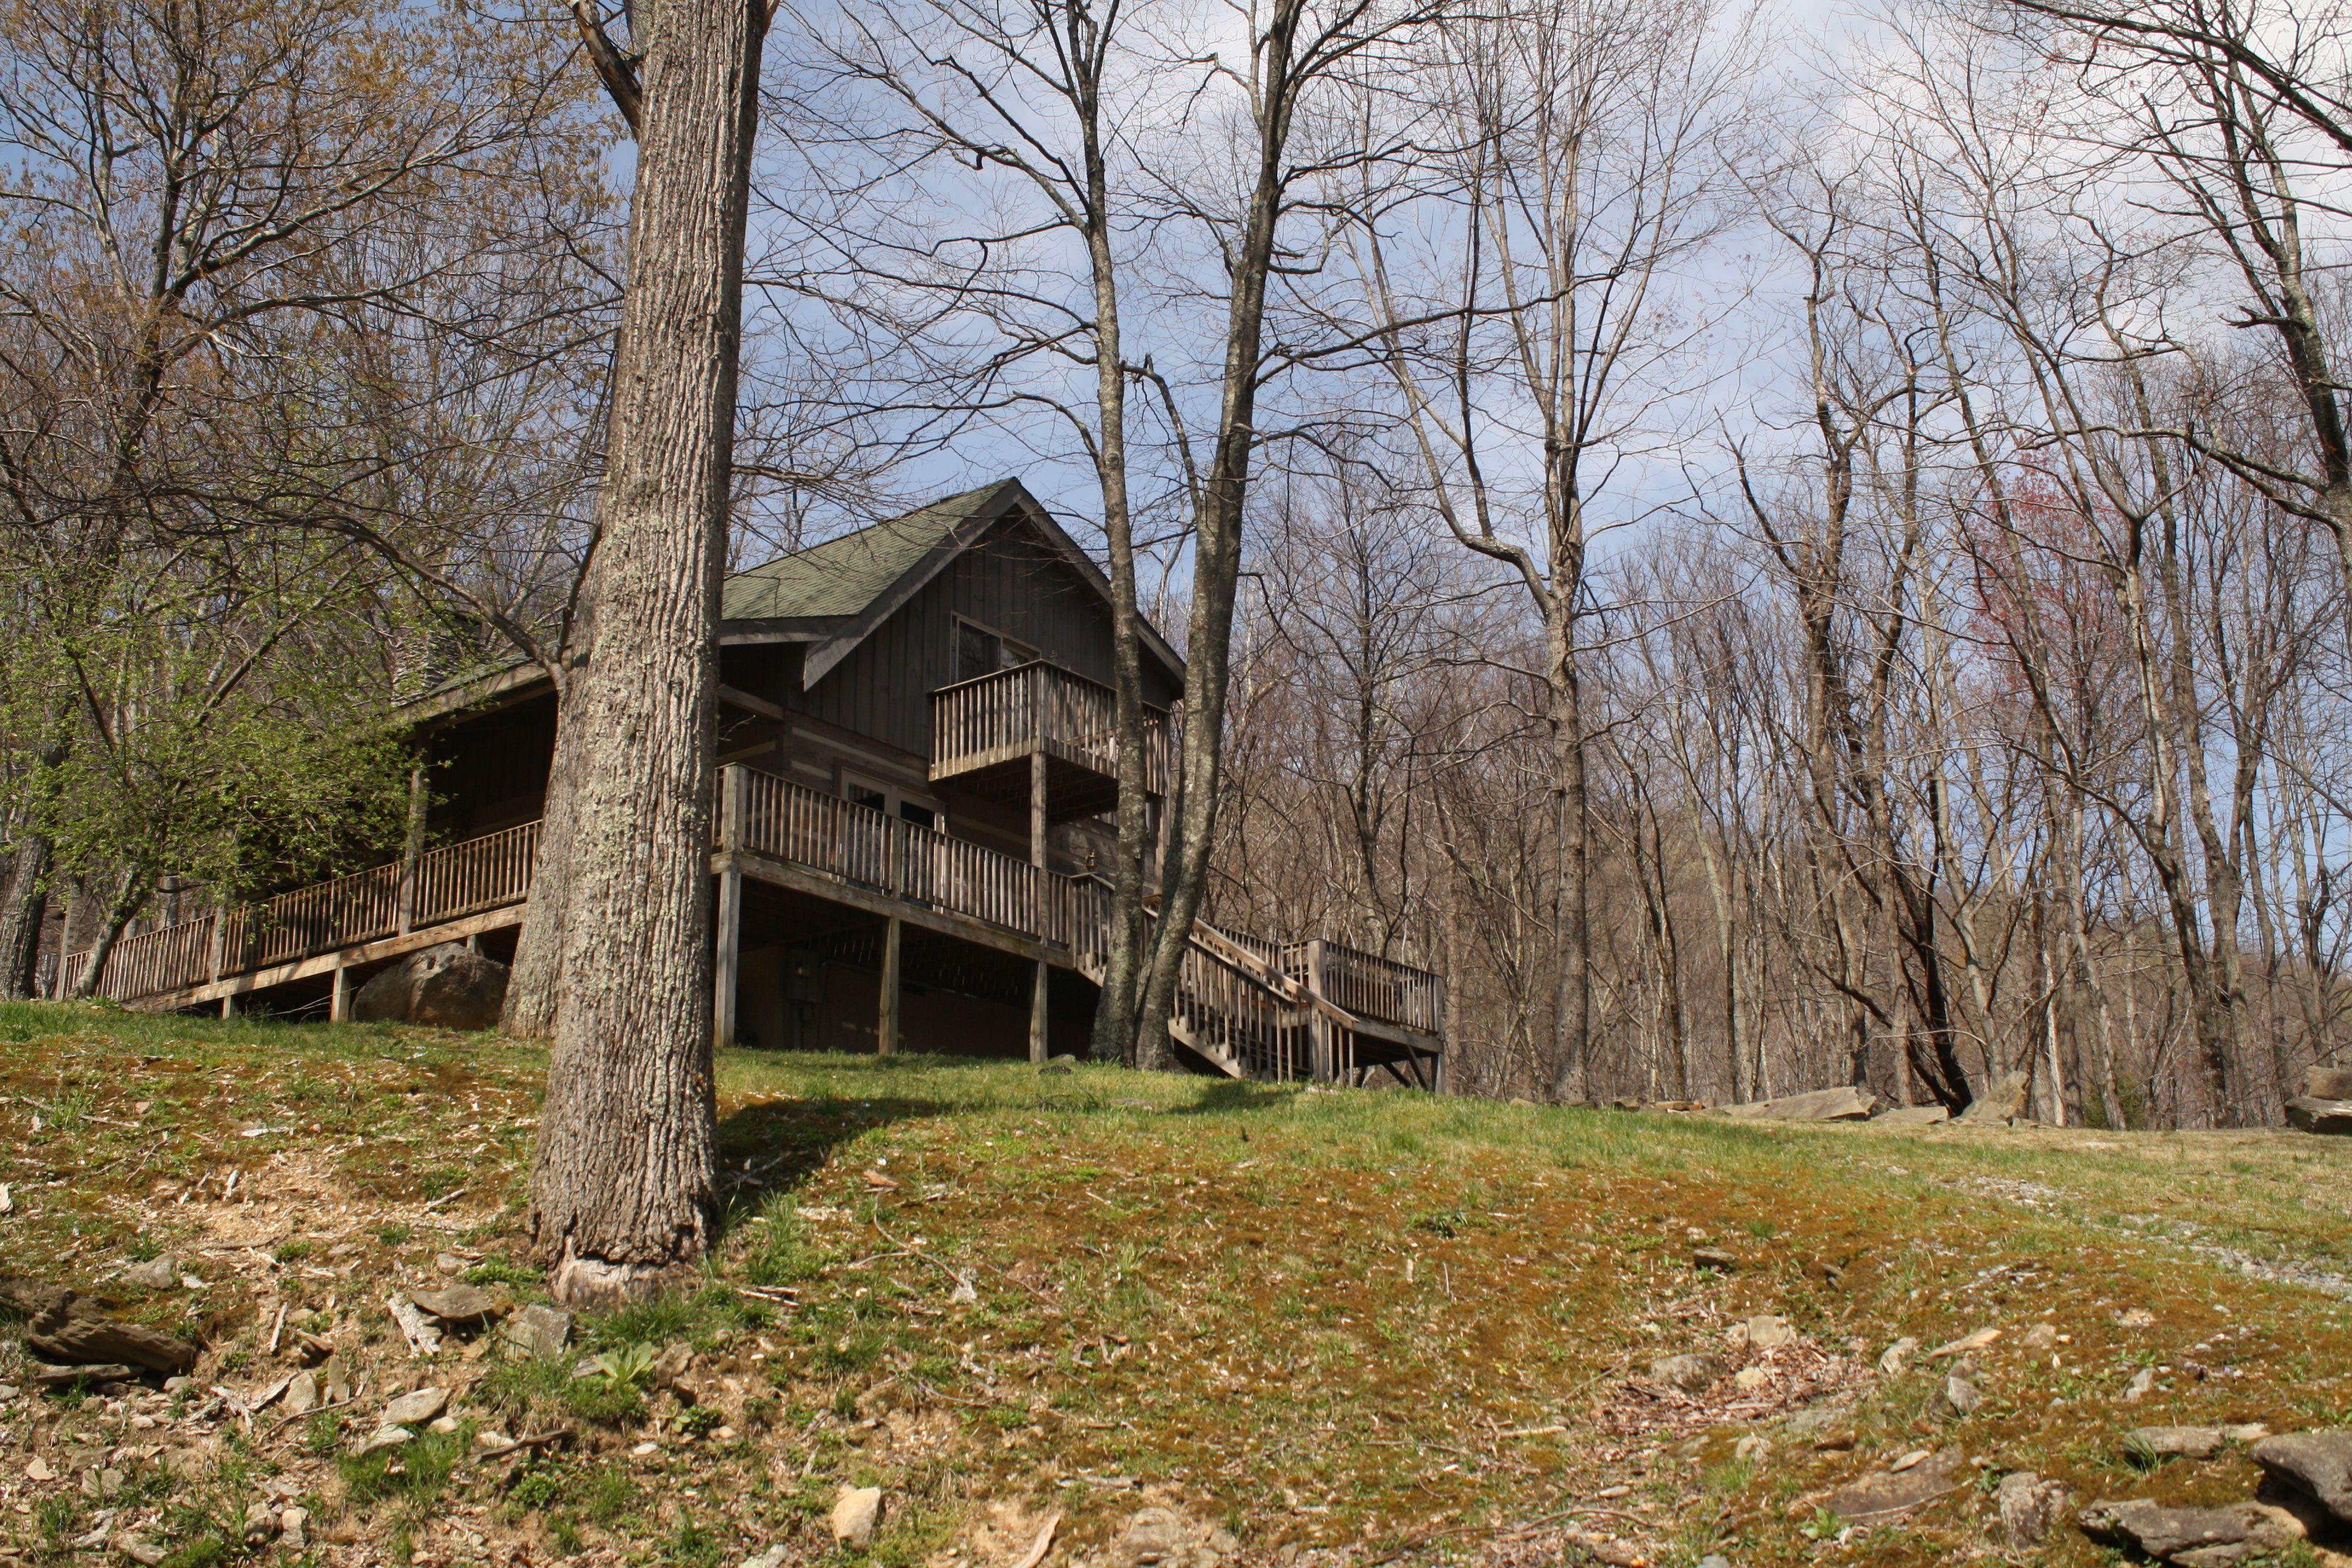 hostel appalachian the trek in hiker cabins ga trail dahlonega profile